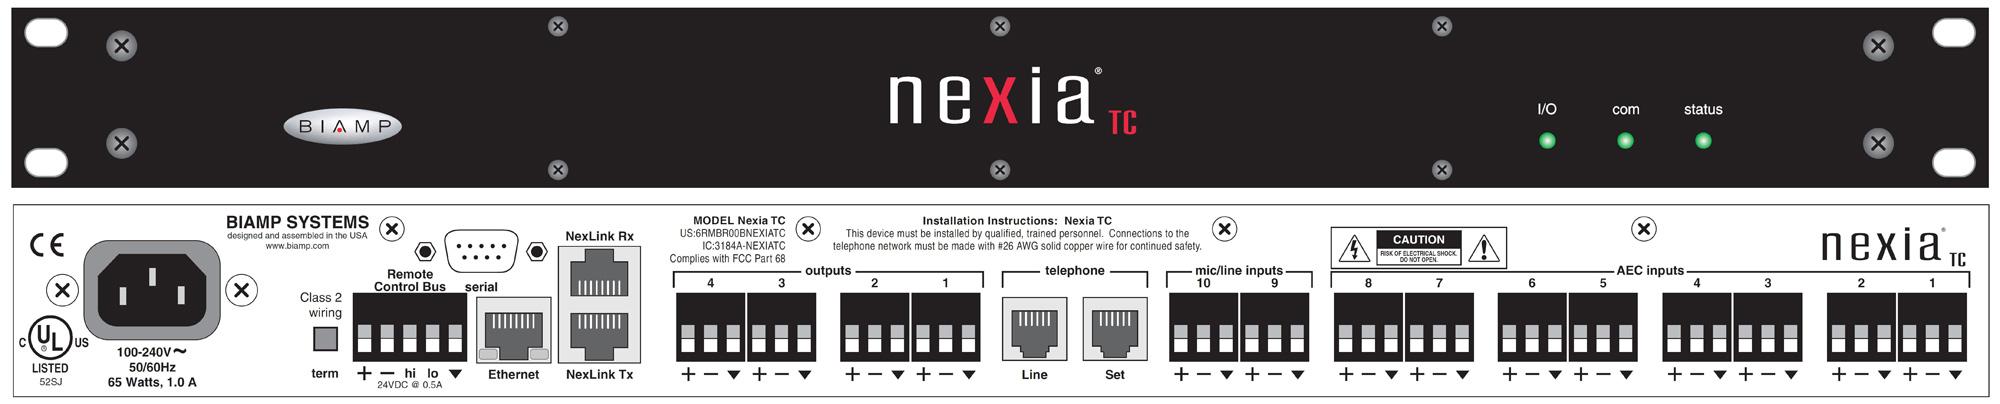 Alexa may 10 connection